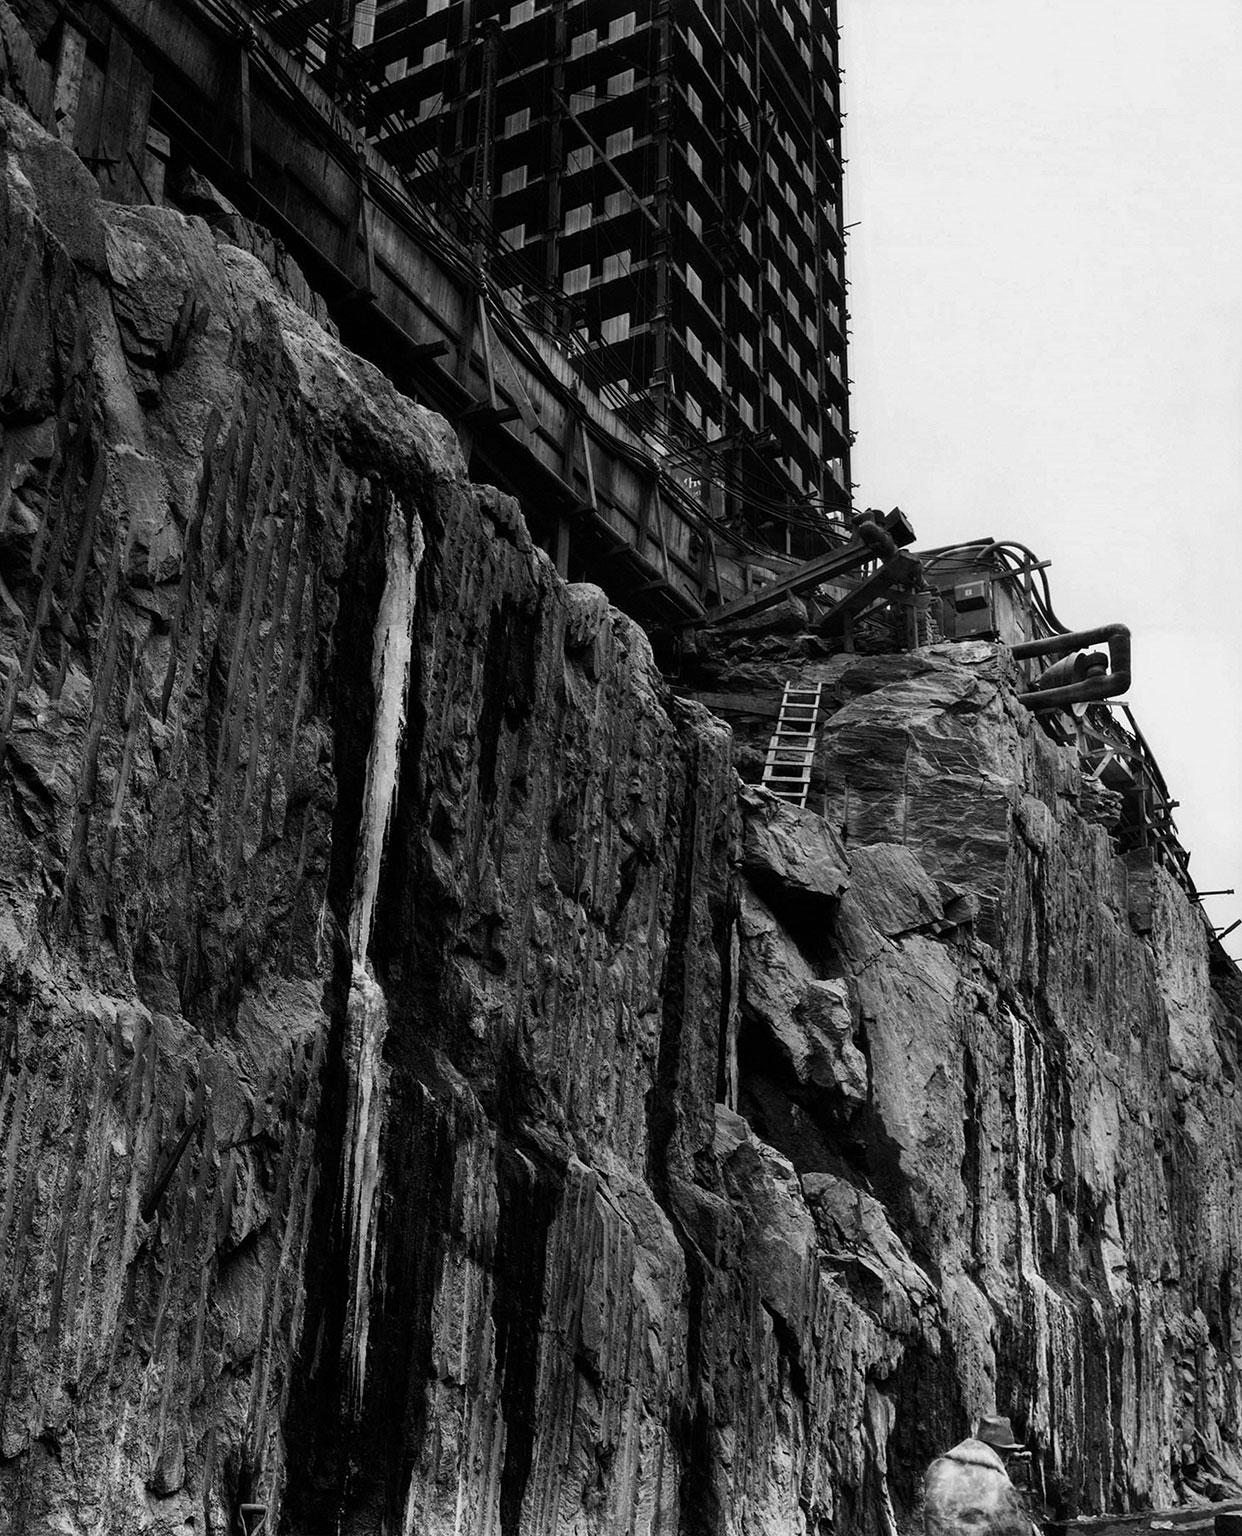 Berenice-Abbott HERO MAGAZINE WEEKEND GUIDE 60'S ART BARBICAN ARCHITECTURE WORLD FURNITURE FASHION JAMES BROWN GET ON UP SOMERSET HOUSE SKATE SIGMAR POLKE